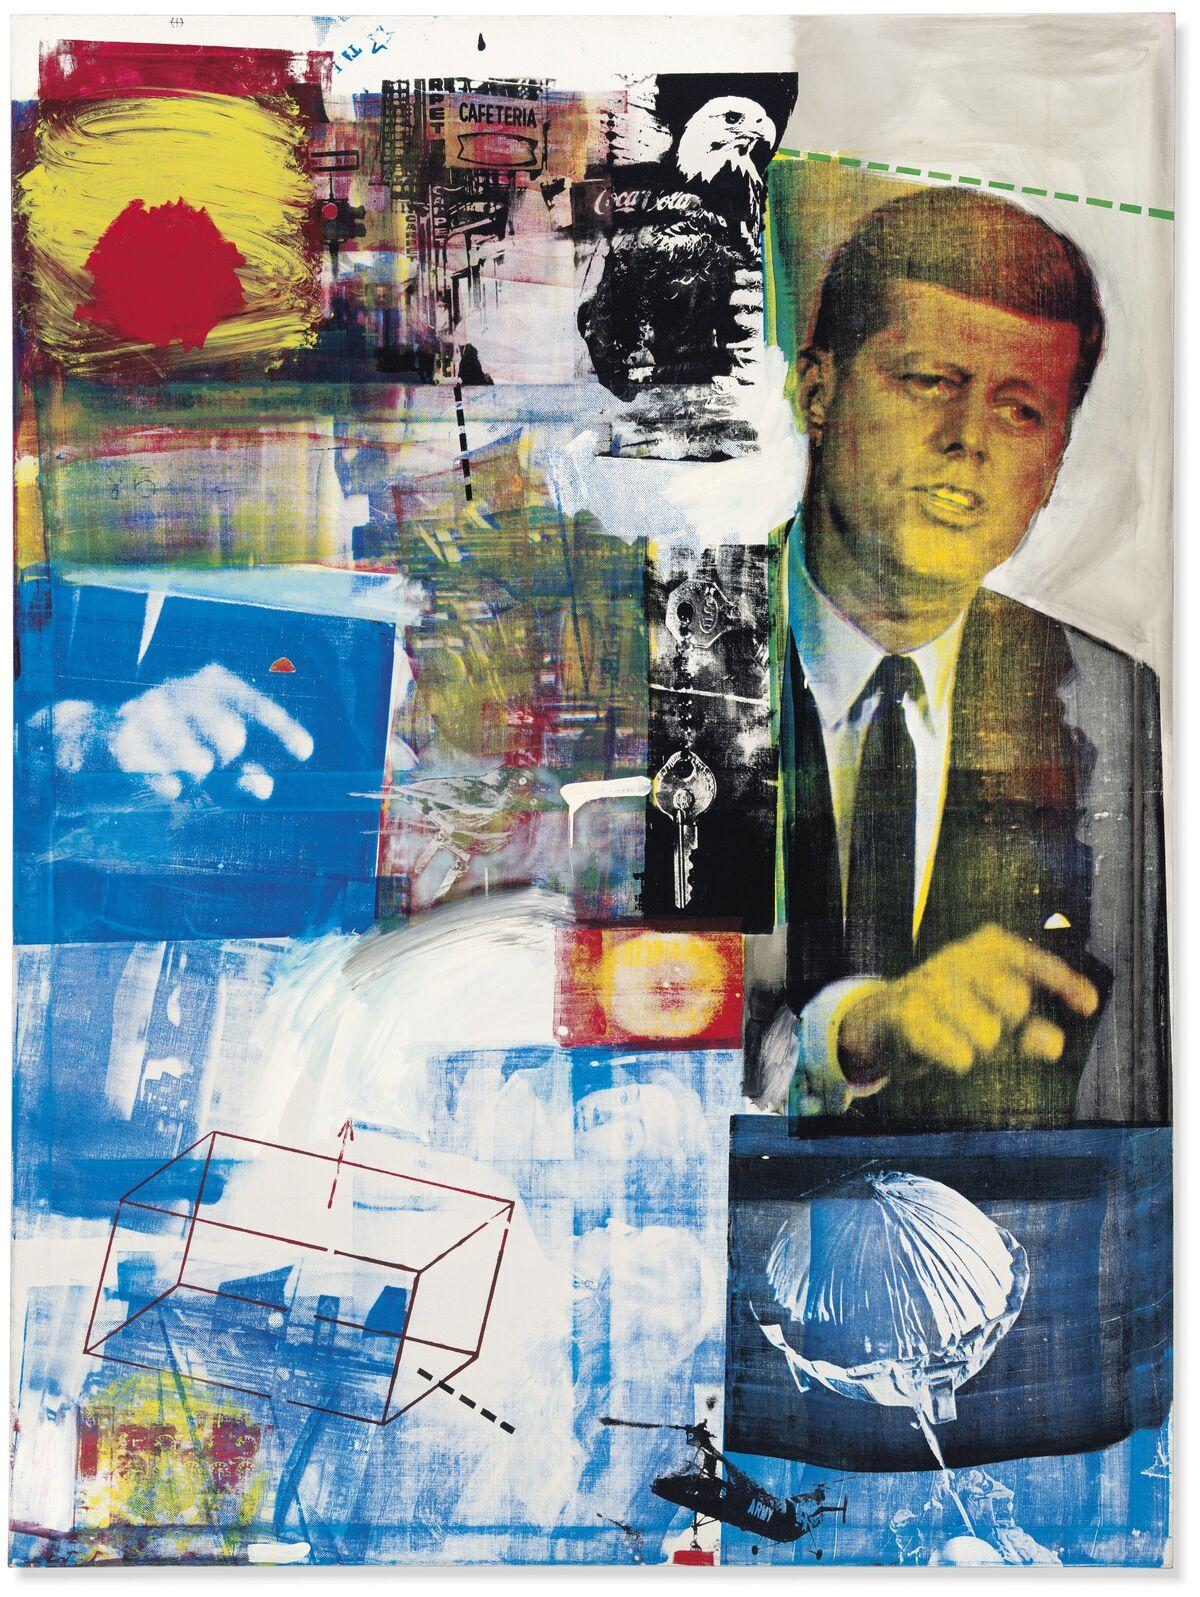 Robert Rauschenberg, Buffalo II,  1964. Courtesy of Christie's.